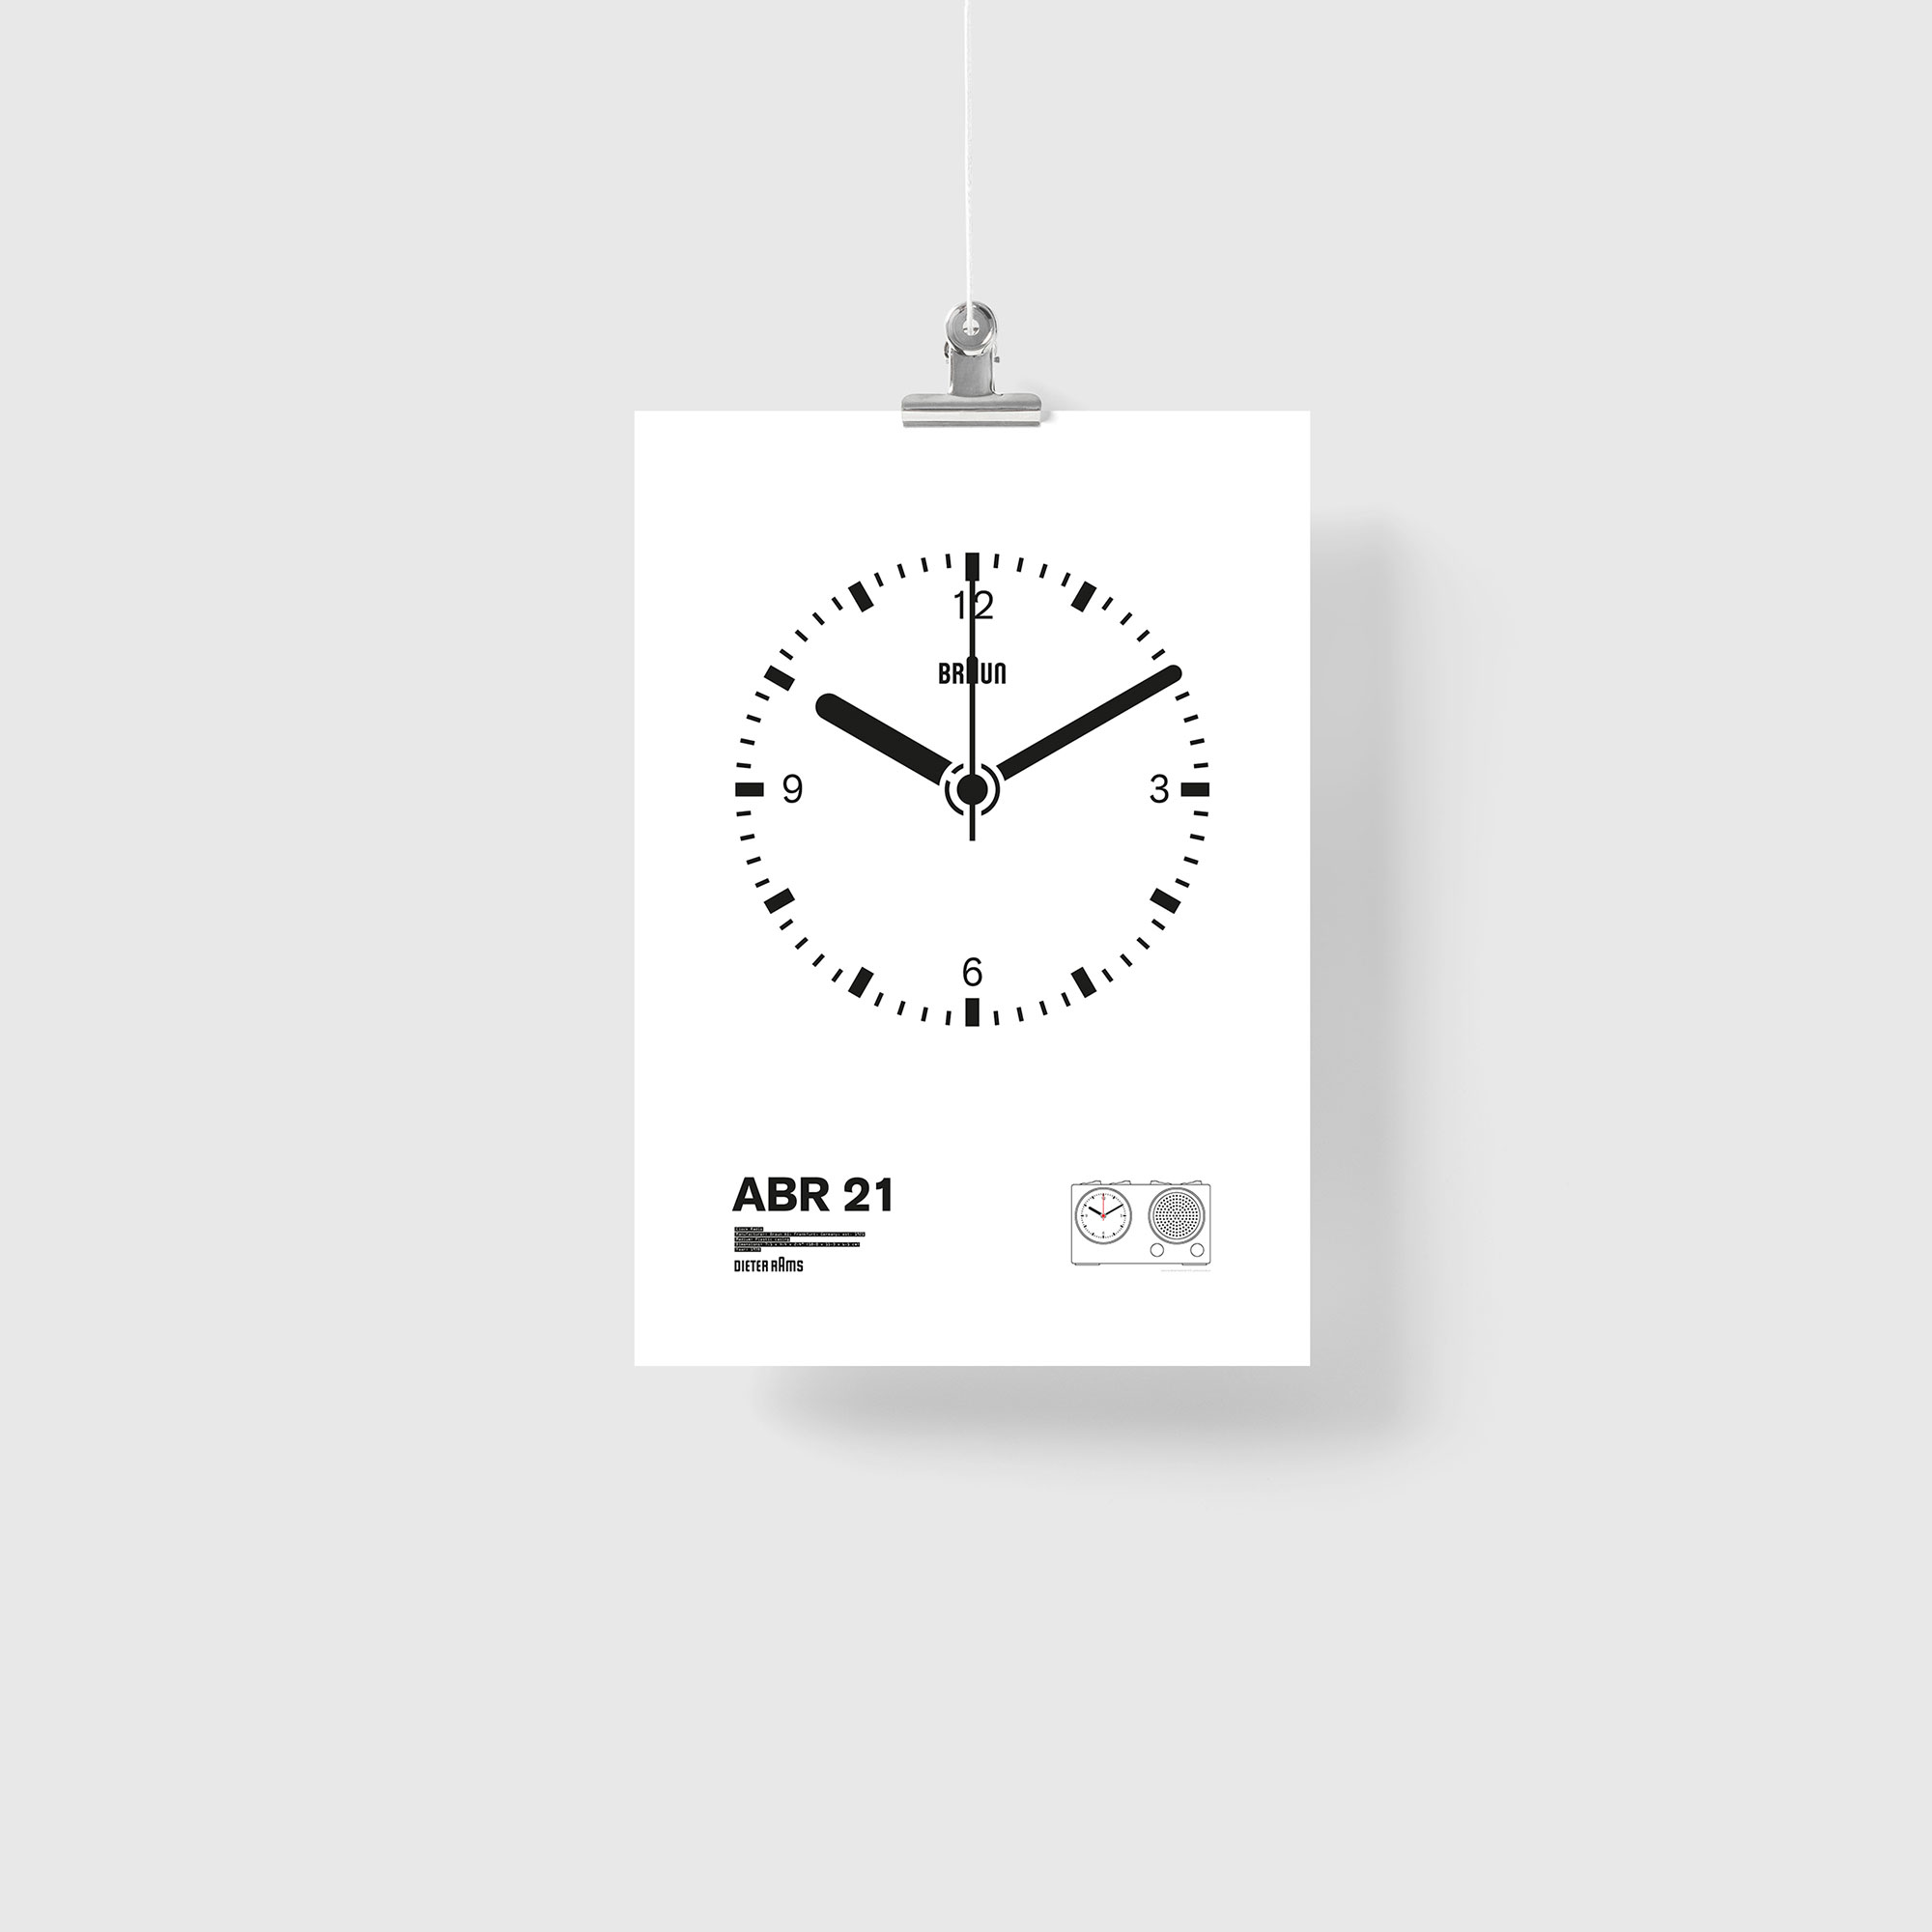 Braun ABR 21 Radio Clock Illustration Poster Giclée Print